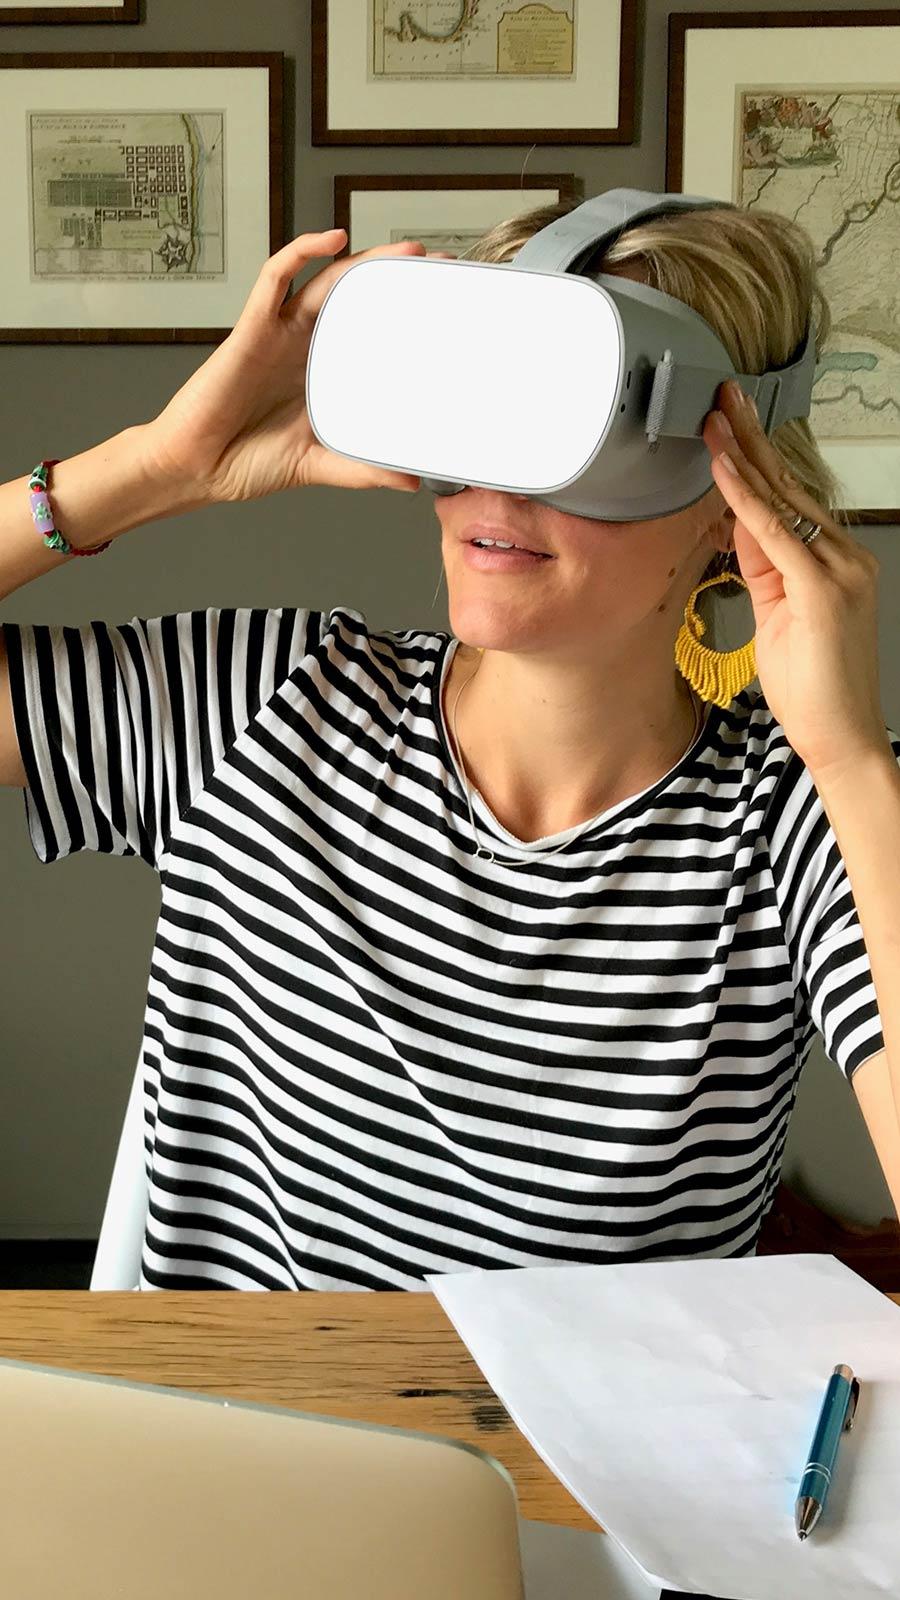 leren-met-virtual-reality